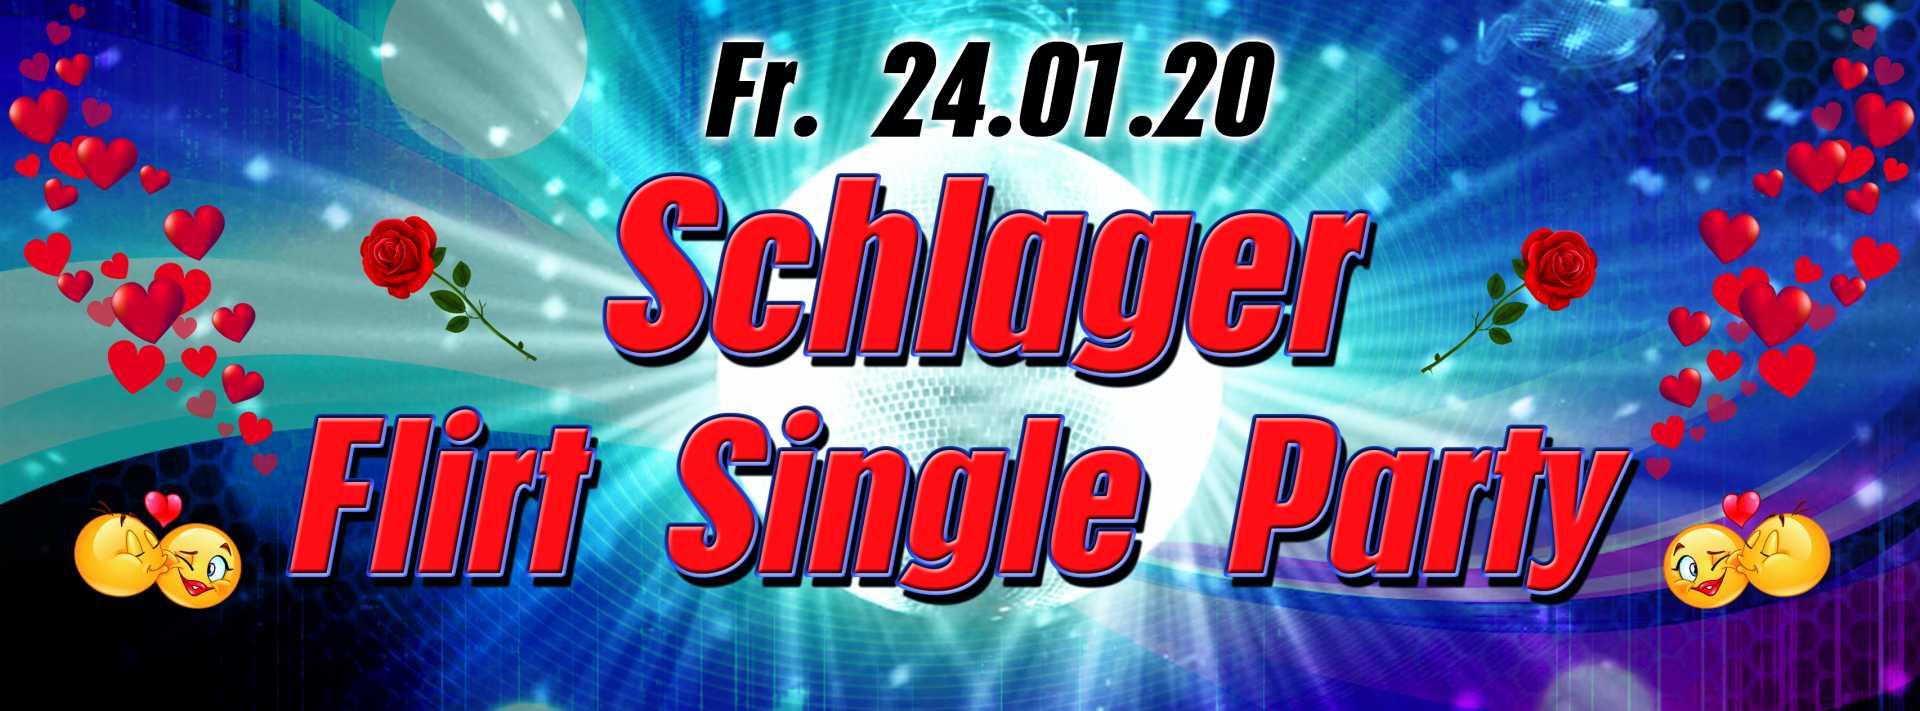 24.01.2020 Schlager Flirt Single Party